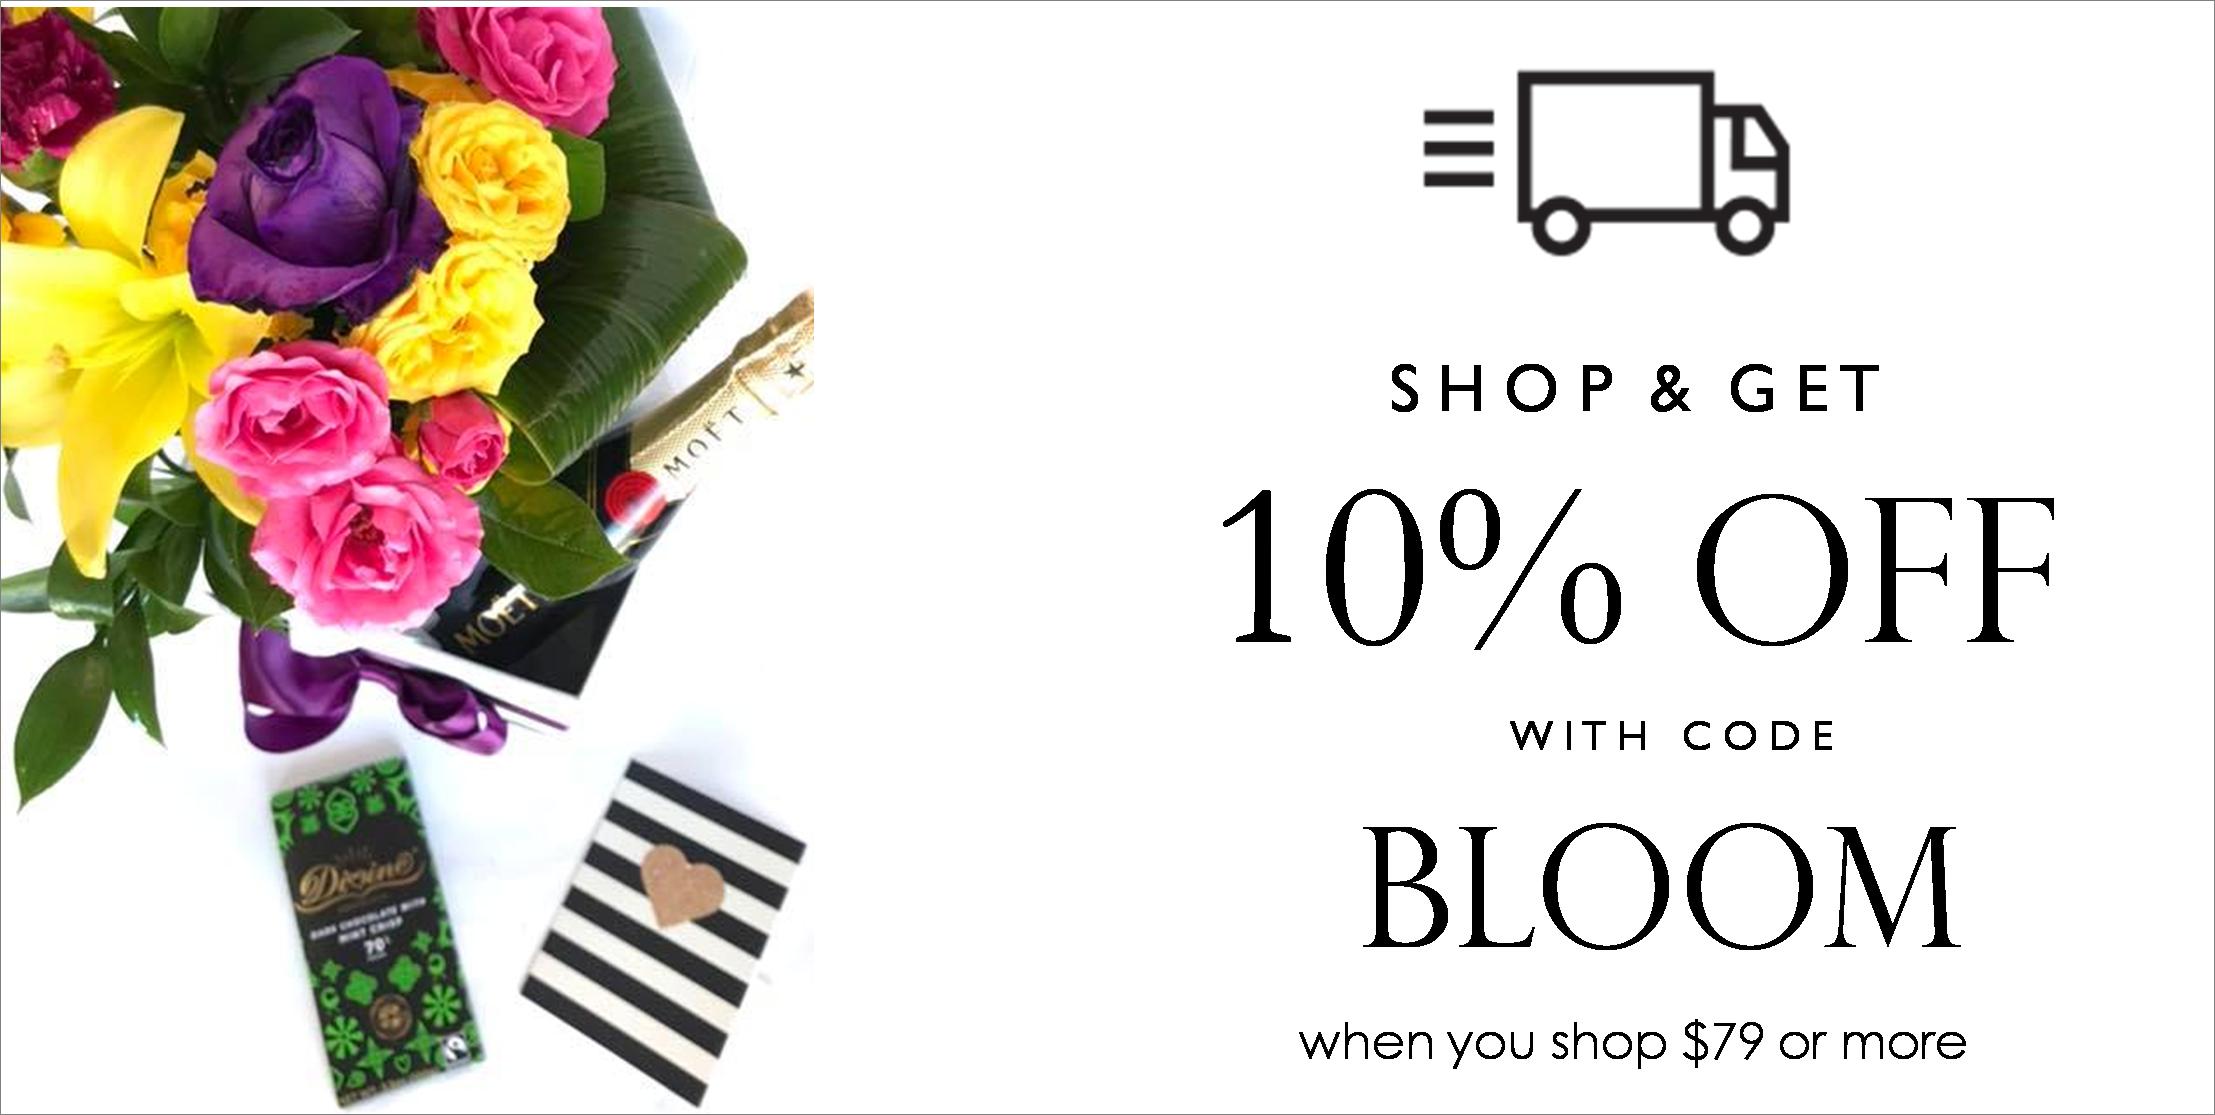 1we-make-el-paso-bloom-with-luxury-gift-rose-boxes-angies-floral-designs-angies-we-make-el-paso-el-paso-florist-birthdays-bloom-floral-instagram-corsages-delivery-rose-birthday-delivery-el-paso-florist-angies-flower.png